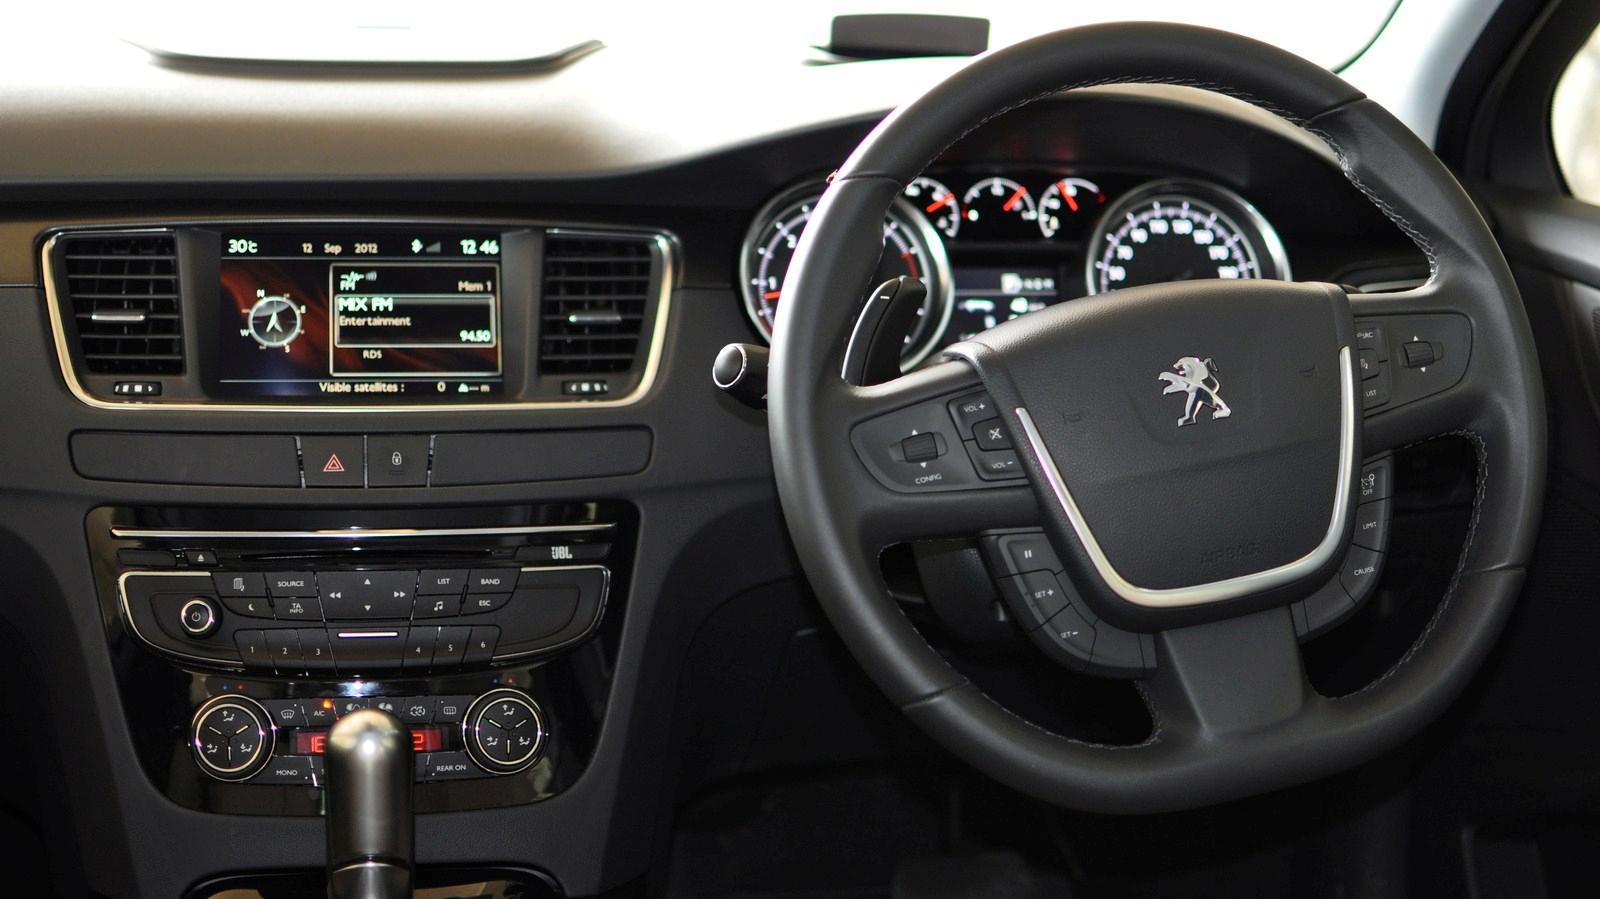 2018 peugeot 508 interior. Fine 508 Peugeot 508 8 Full Size With 2018 Peugeot Interior